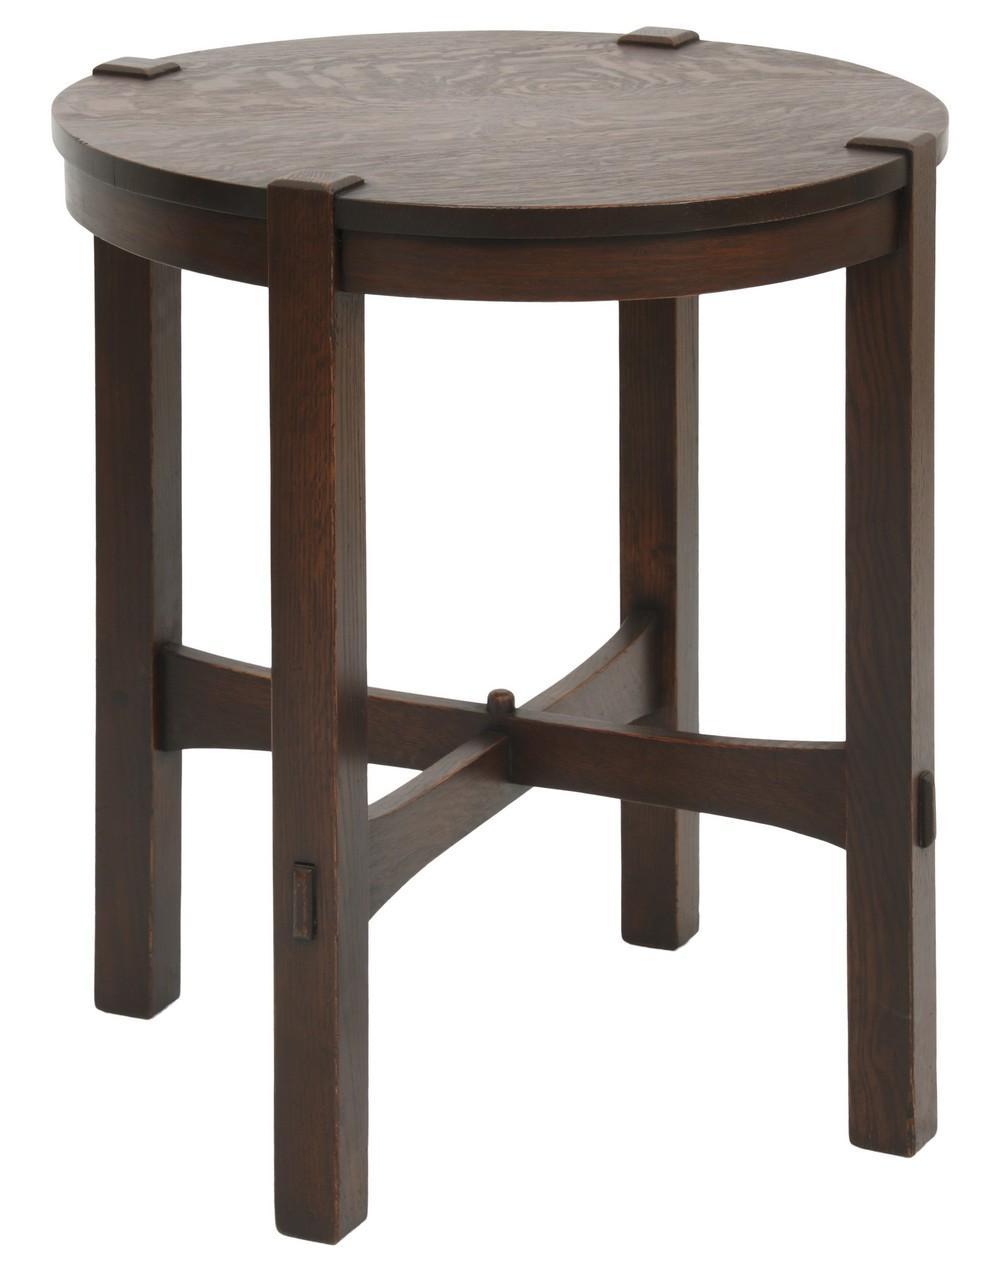 Gustav Stickley No. 436 Table